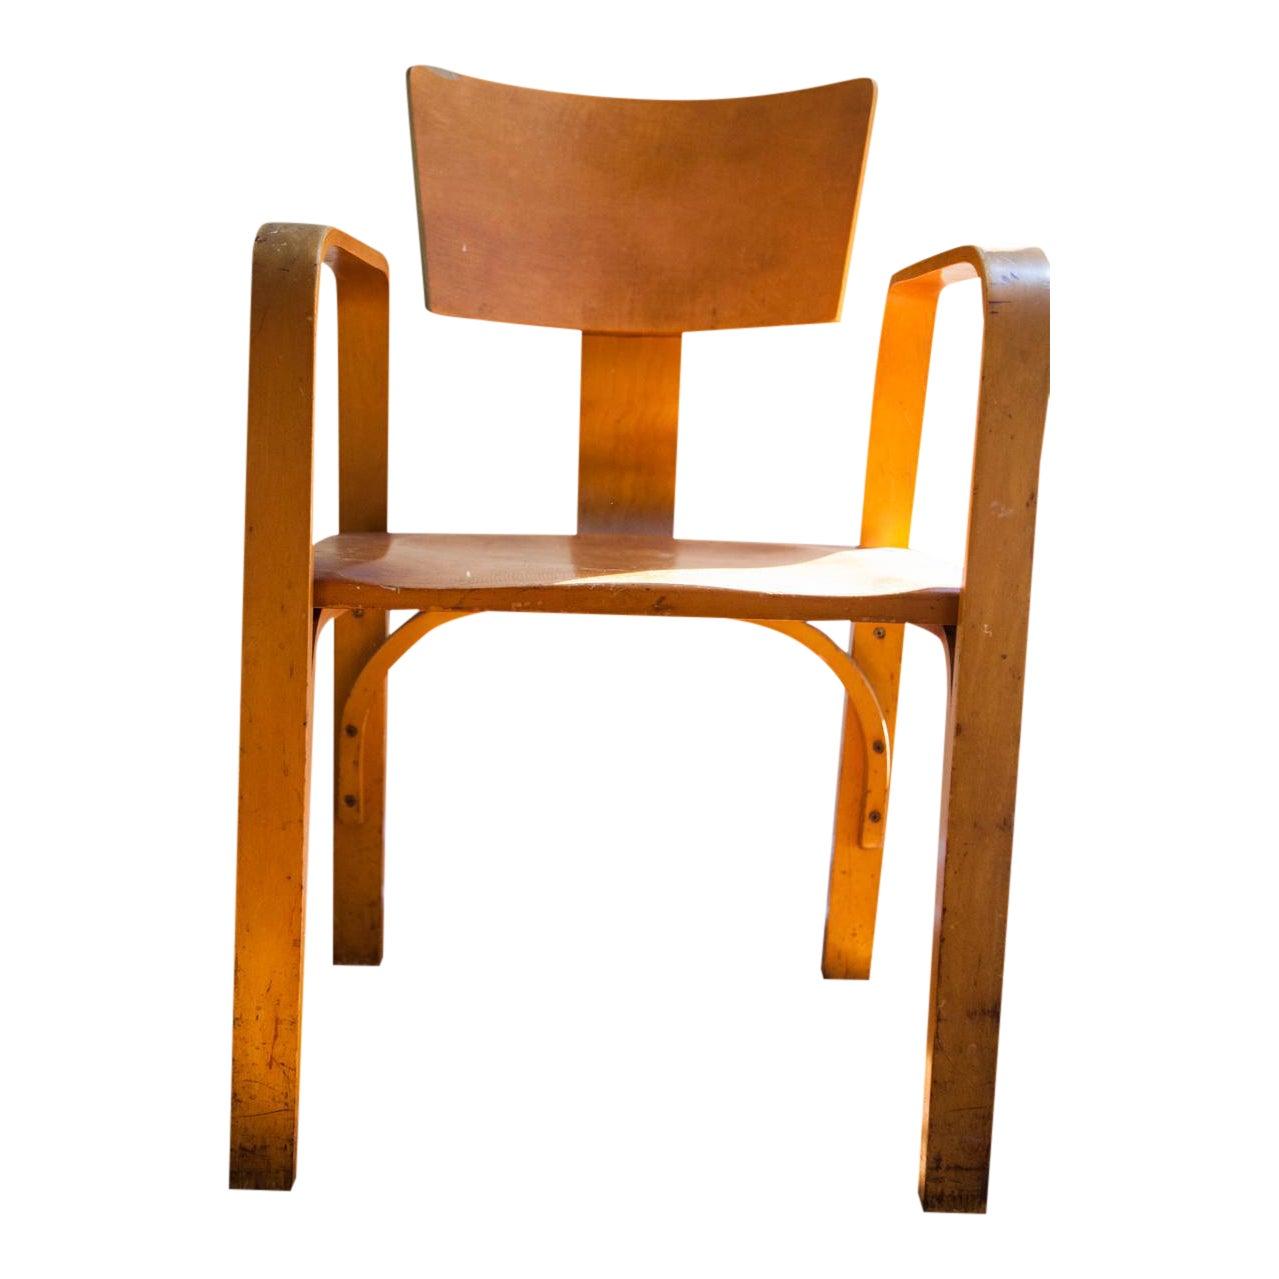 Vintage Thonet Bent Plywood Chair Chairish